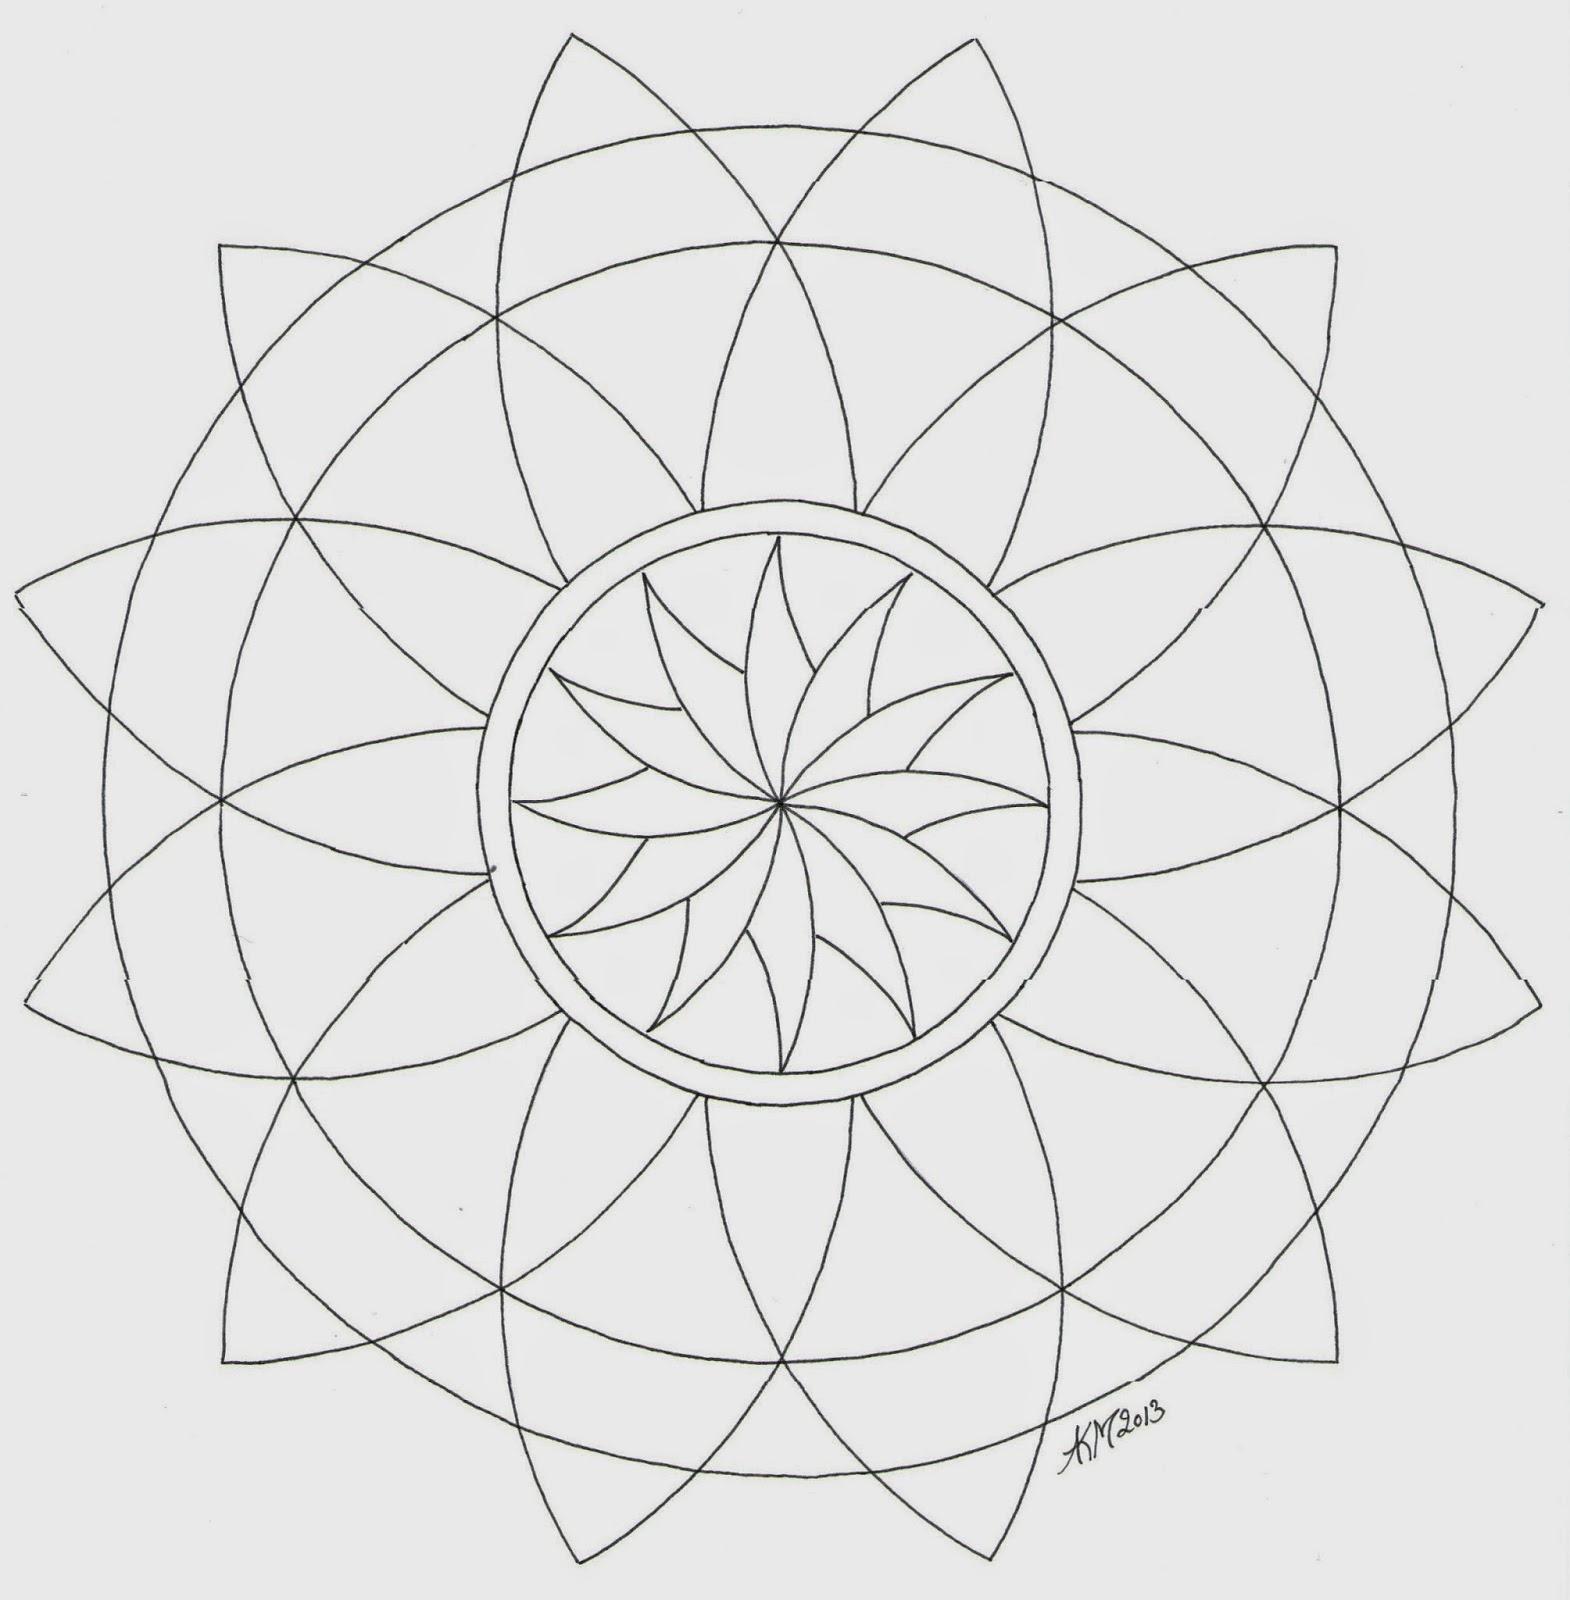 Mandala Kleurplaten Bestellen.Mandala Atelier Mandala Kleurplaten En Templates 2013